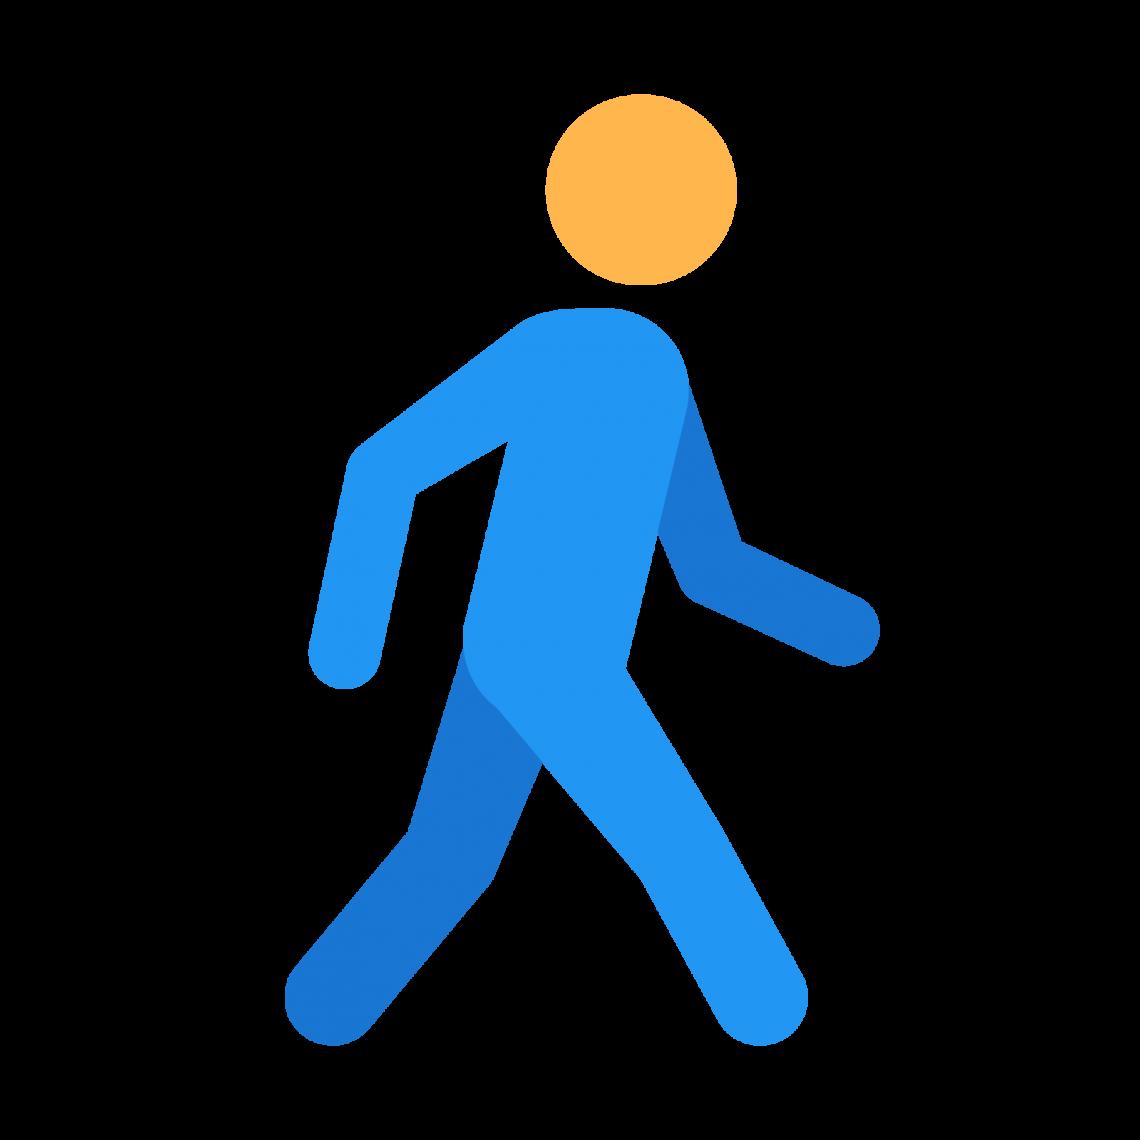 efek ajaib manfaat jalan kaki bagi tubuh